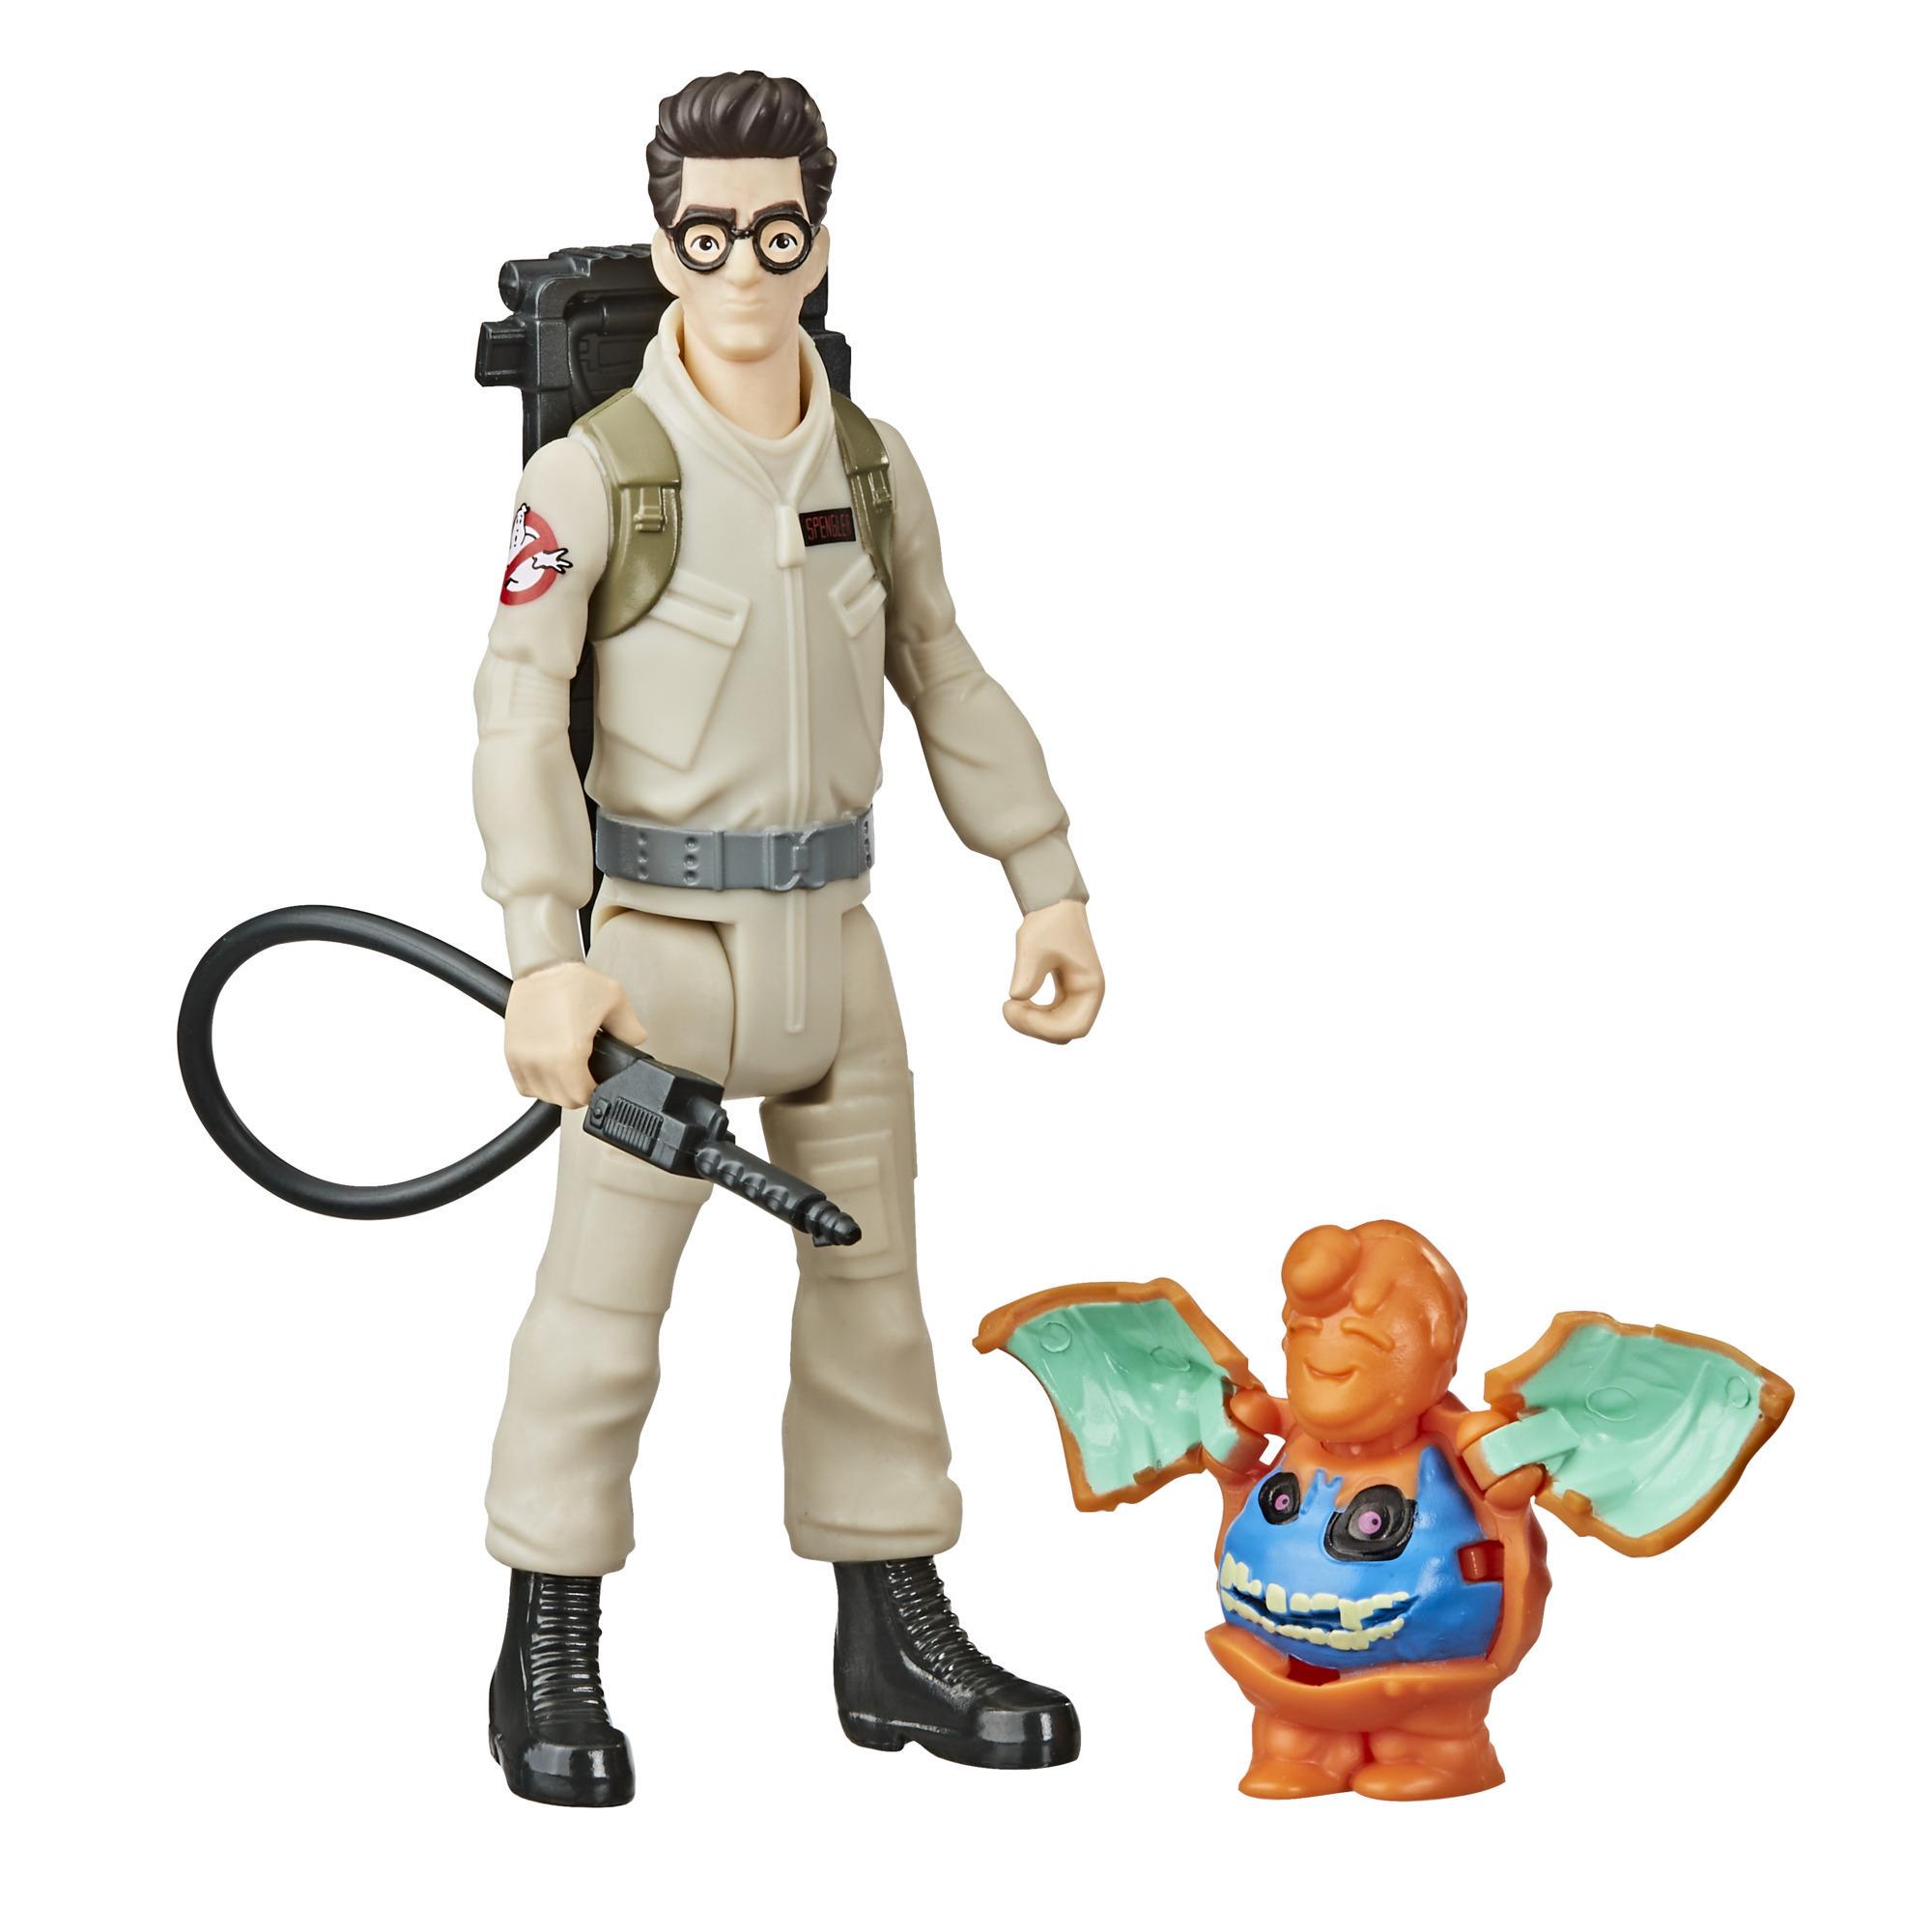 Ghostbusters Geisterschreck Figur Egon Spengler